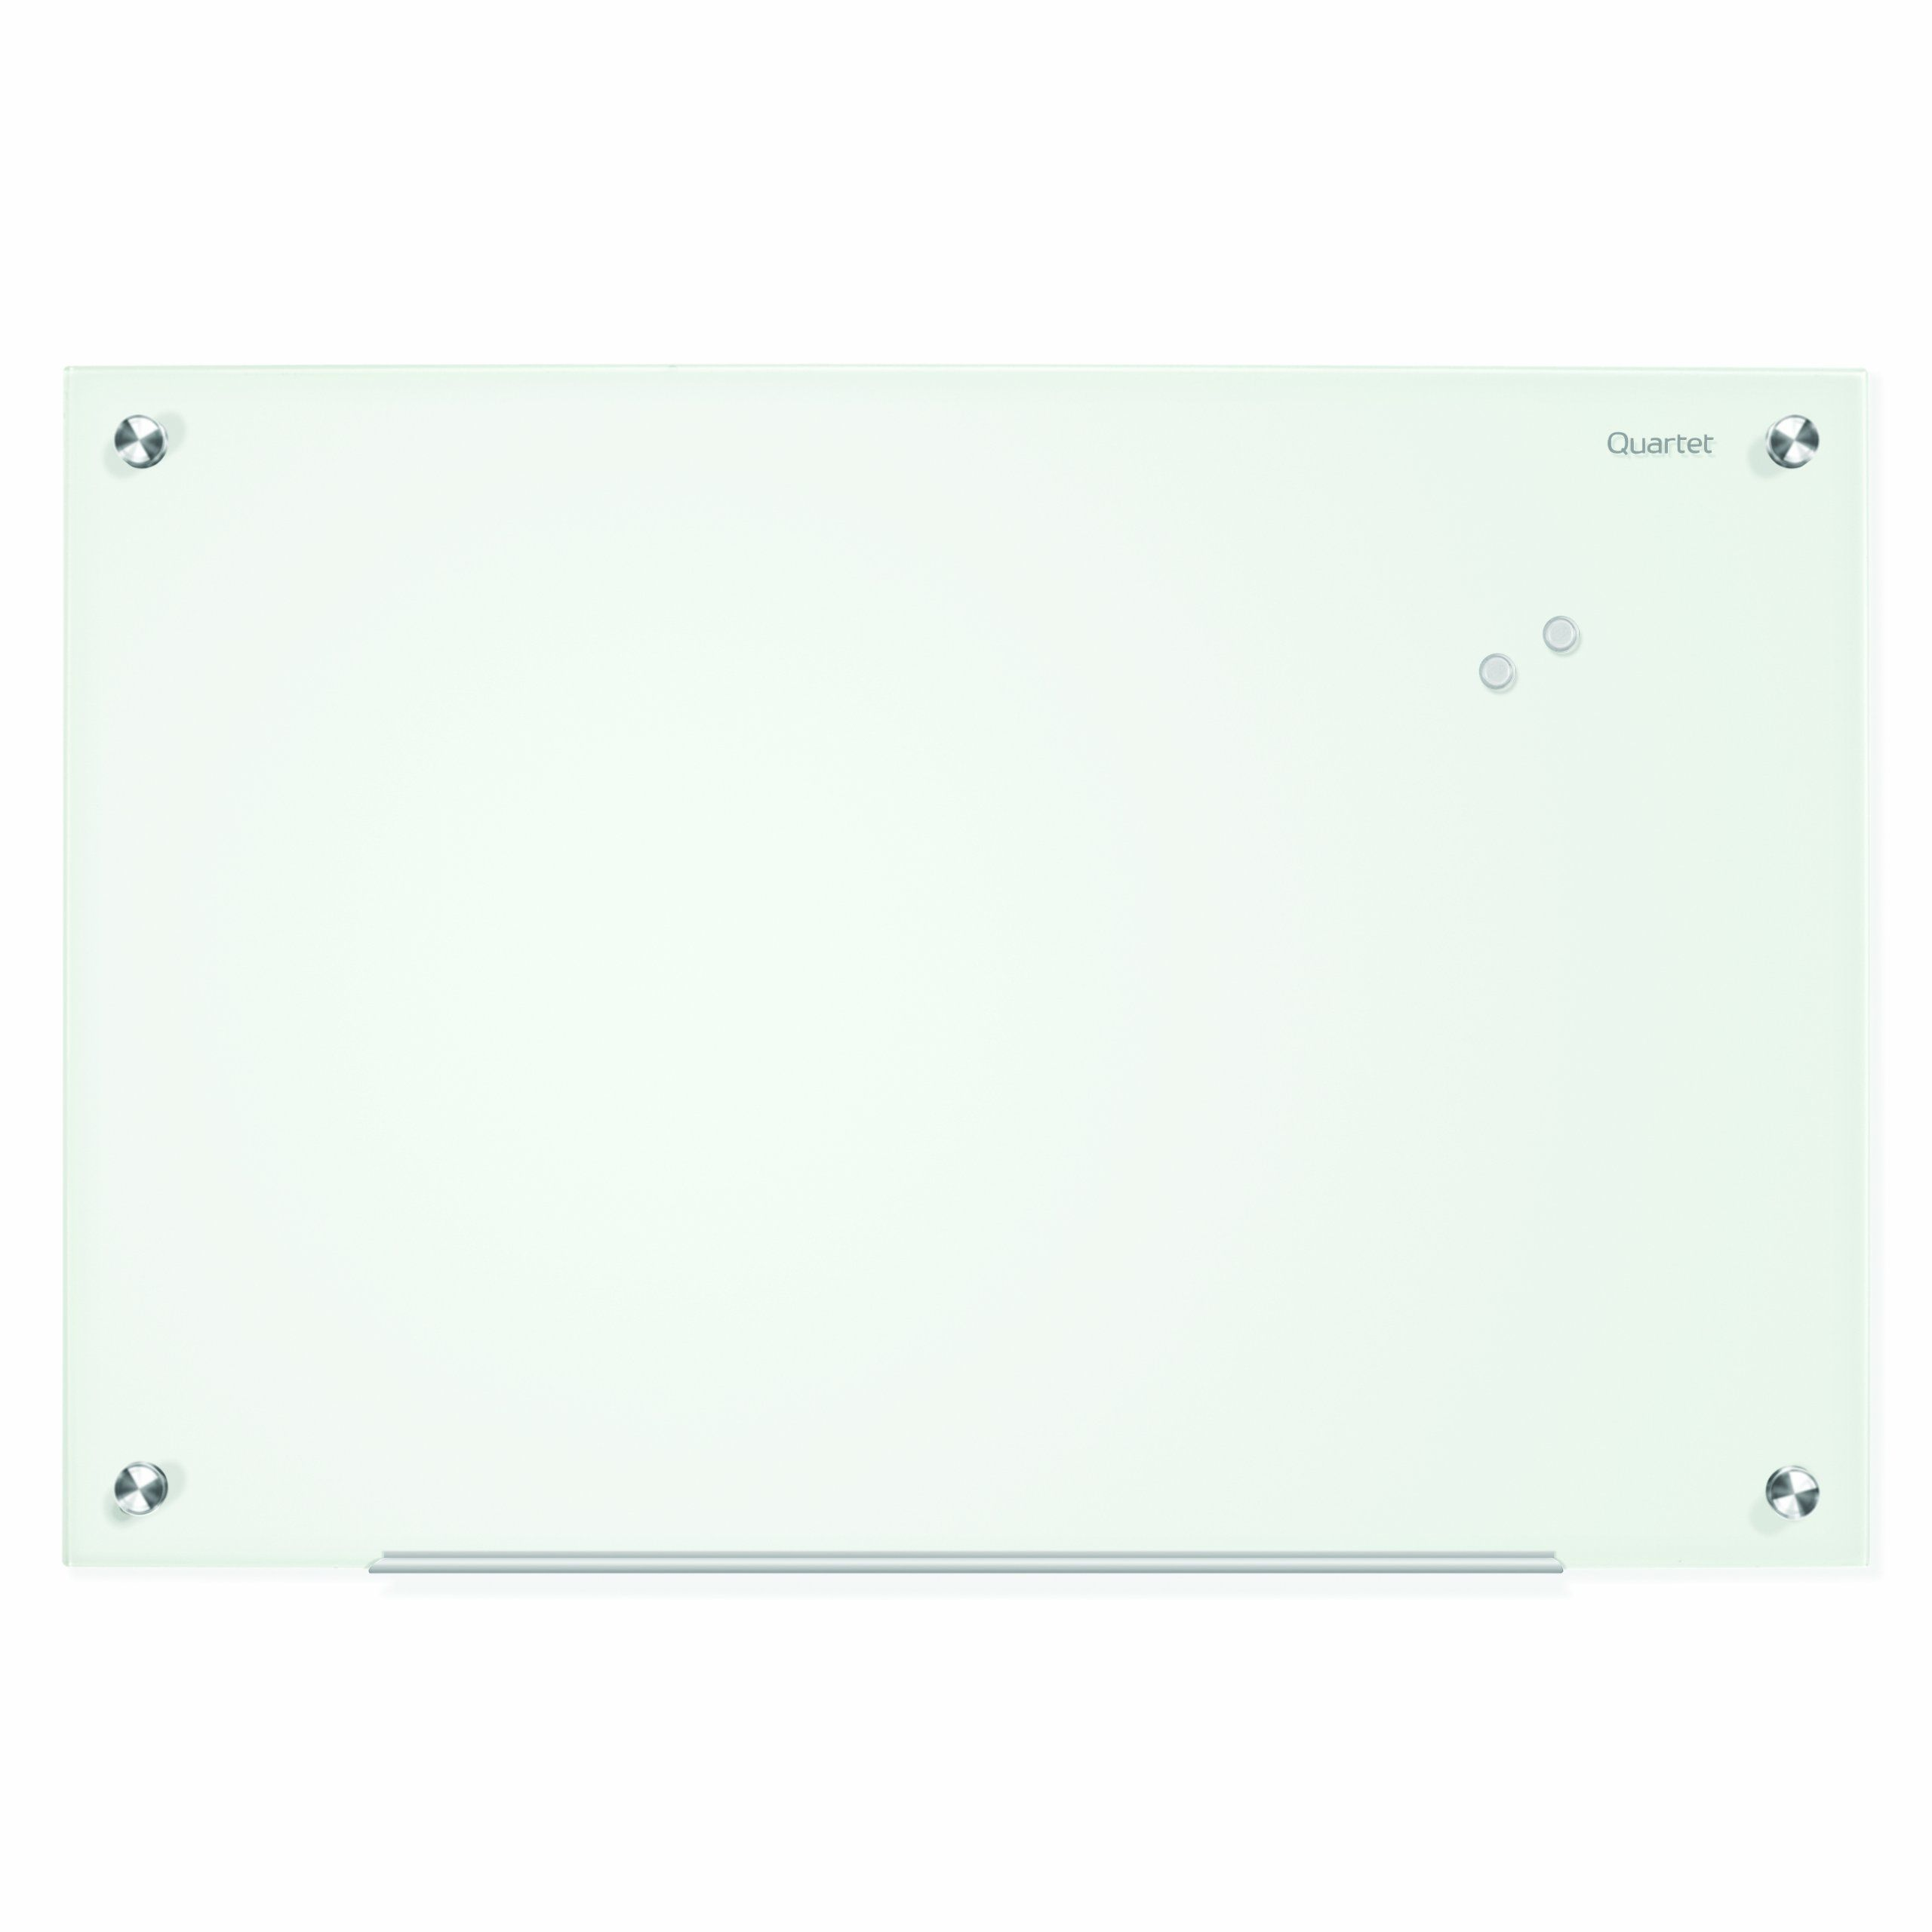 150 Amazon Quartet Infinity Magnetic Glass Dry Erase Board 4 X 3 Feet White 3413820115 White Amazon Ca Marker Board Glass Dry Erase Board Glass Marker